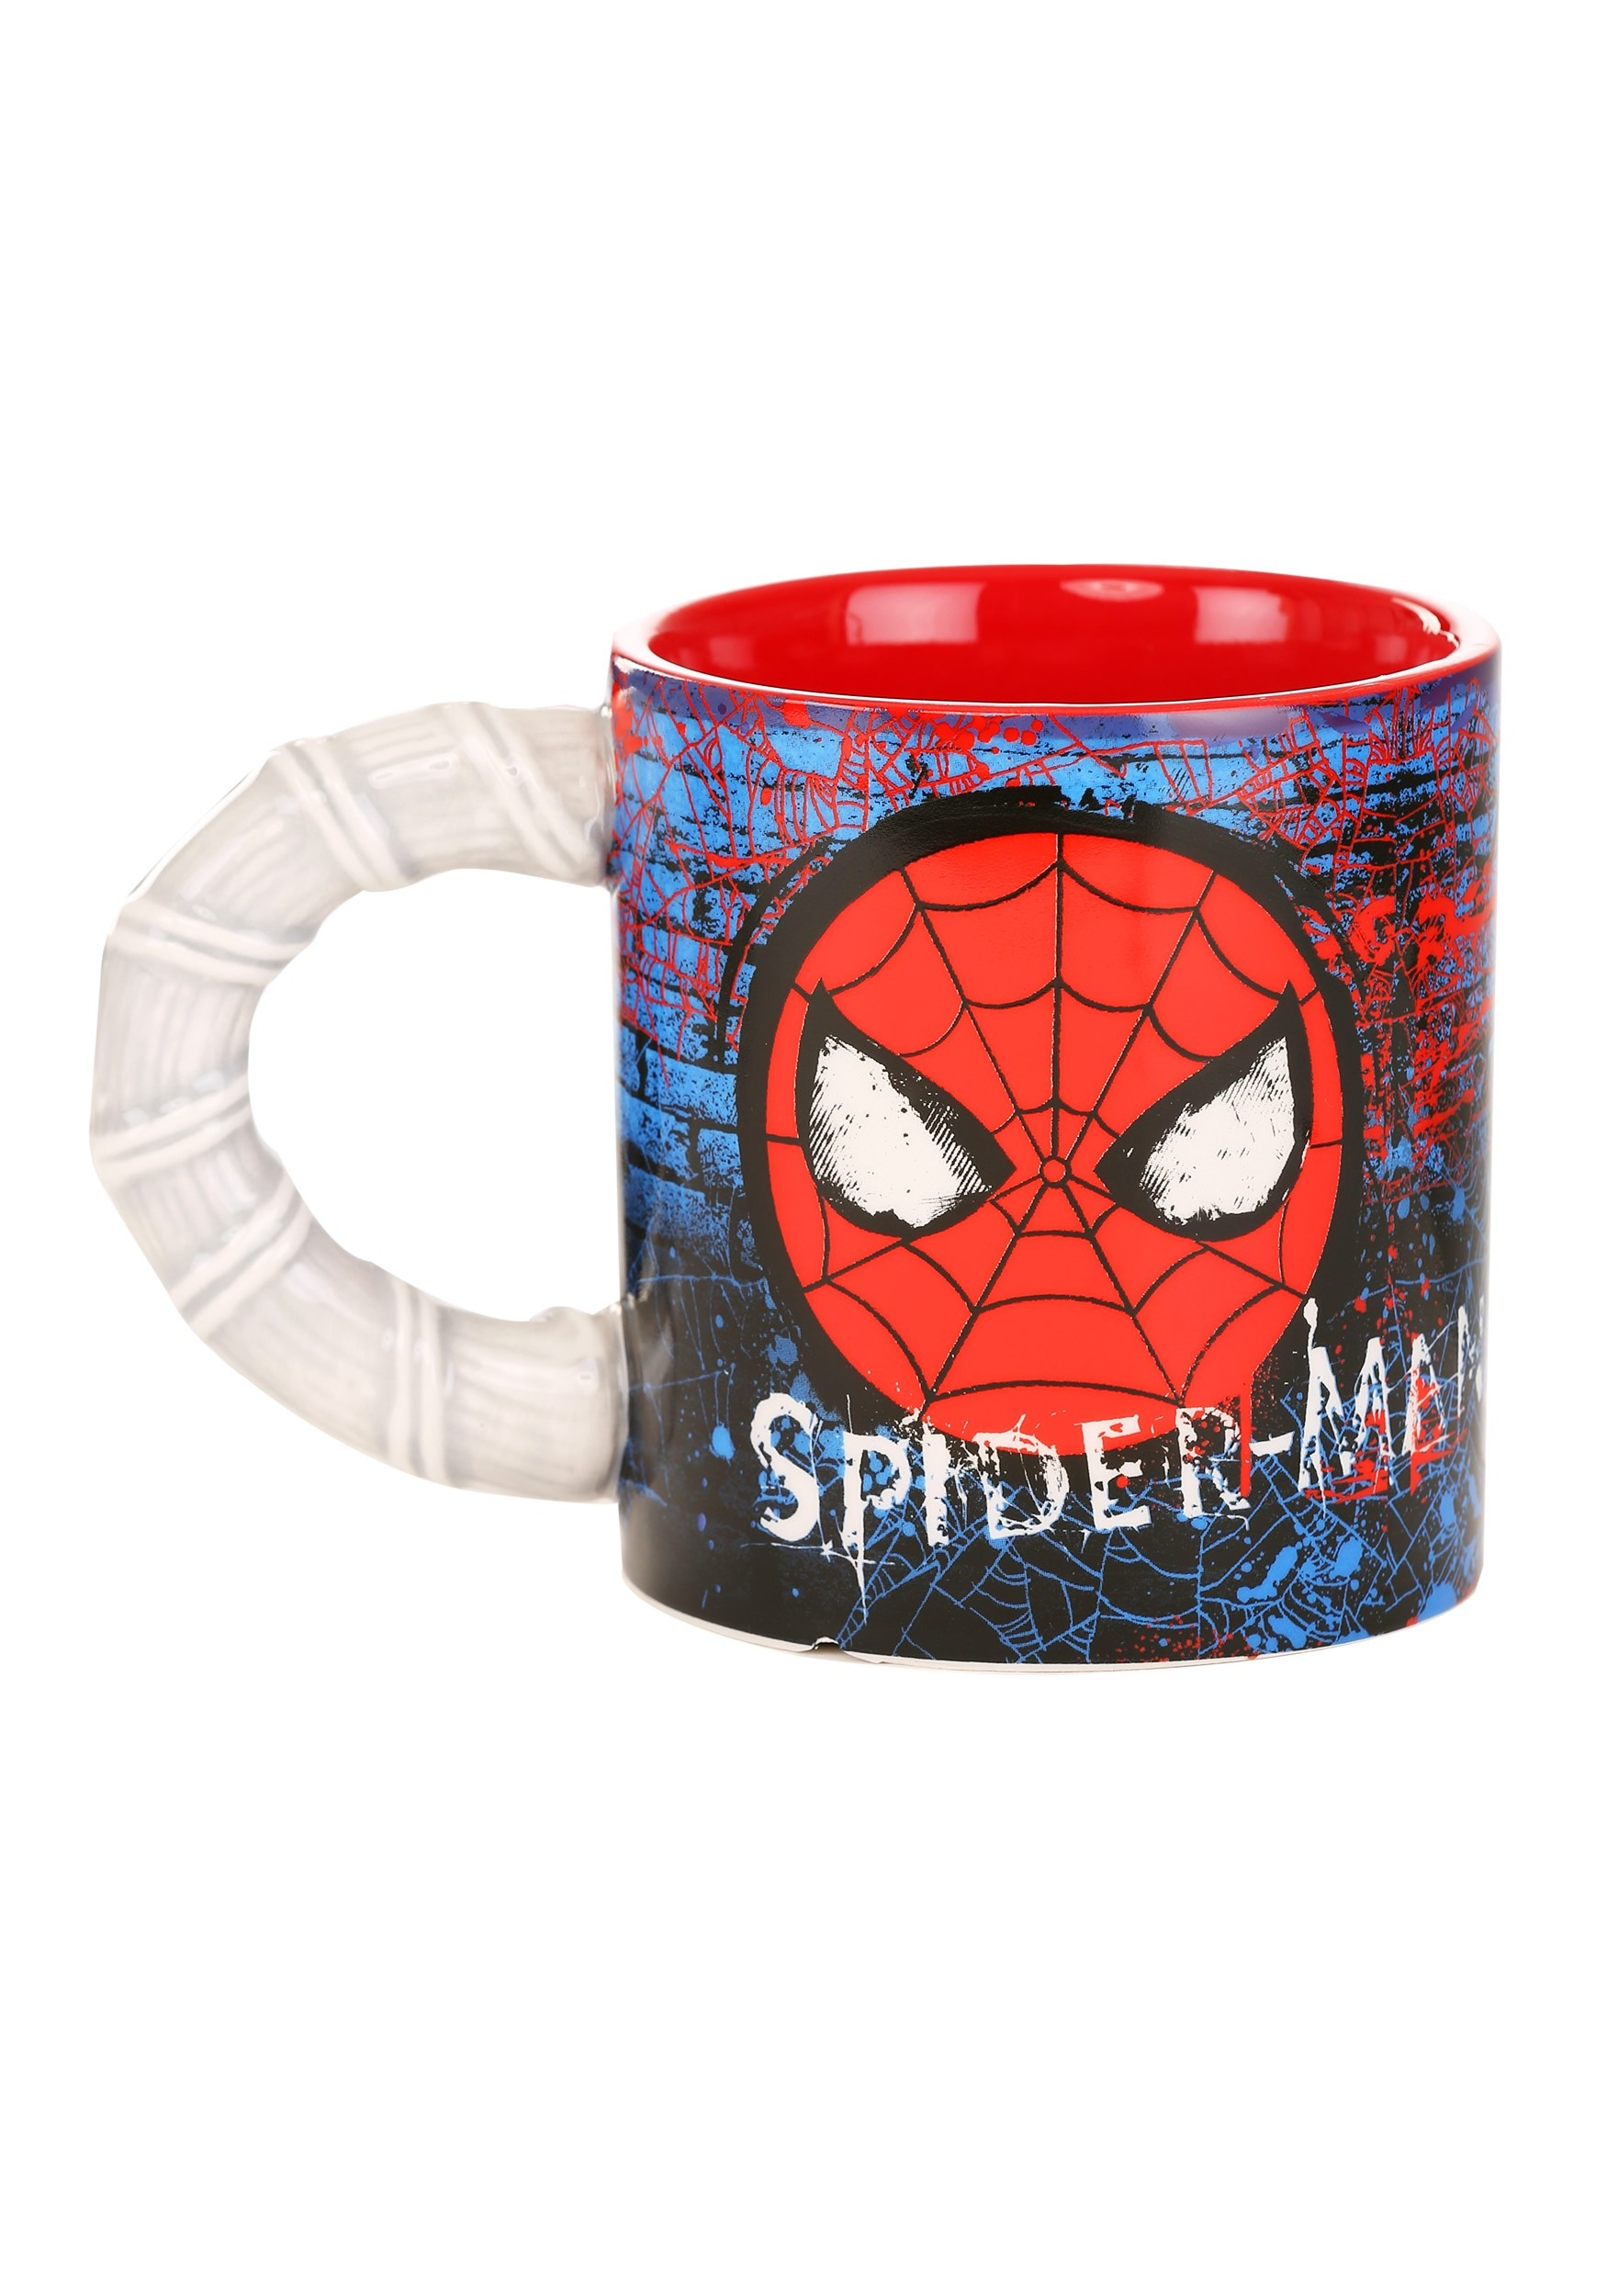 Spider-Man Brick Web Slinger 20oz Ceramic Mug